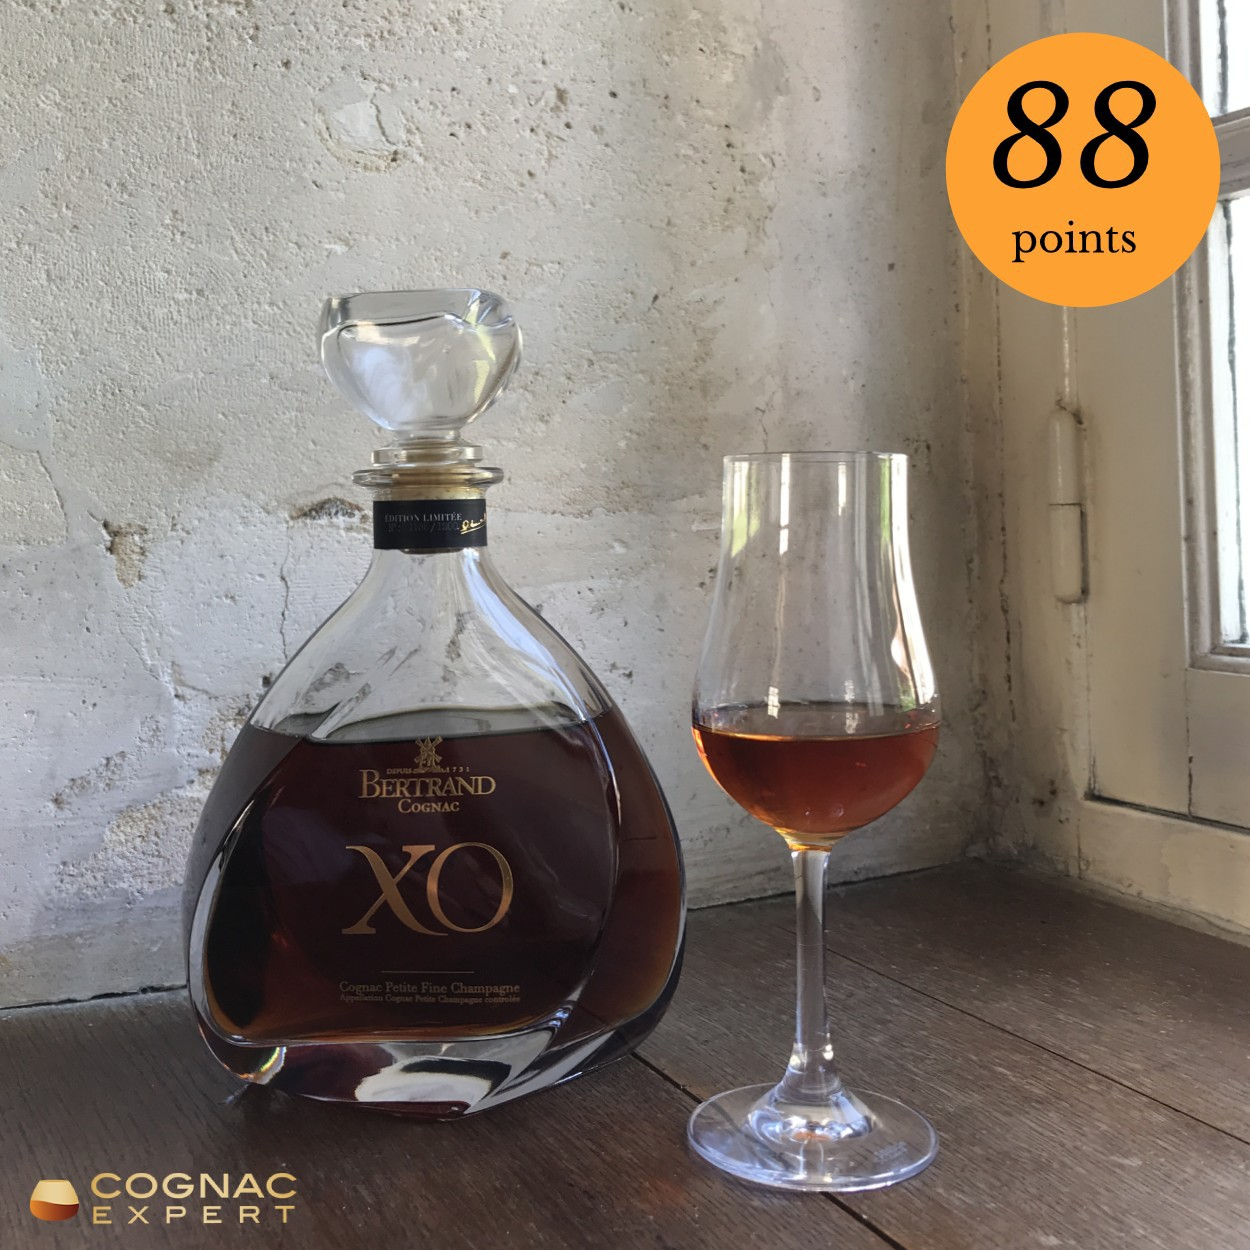 Bertrand XO Cognac and glass